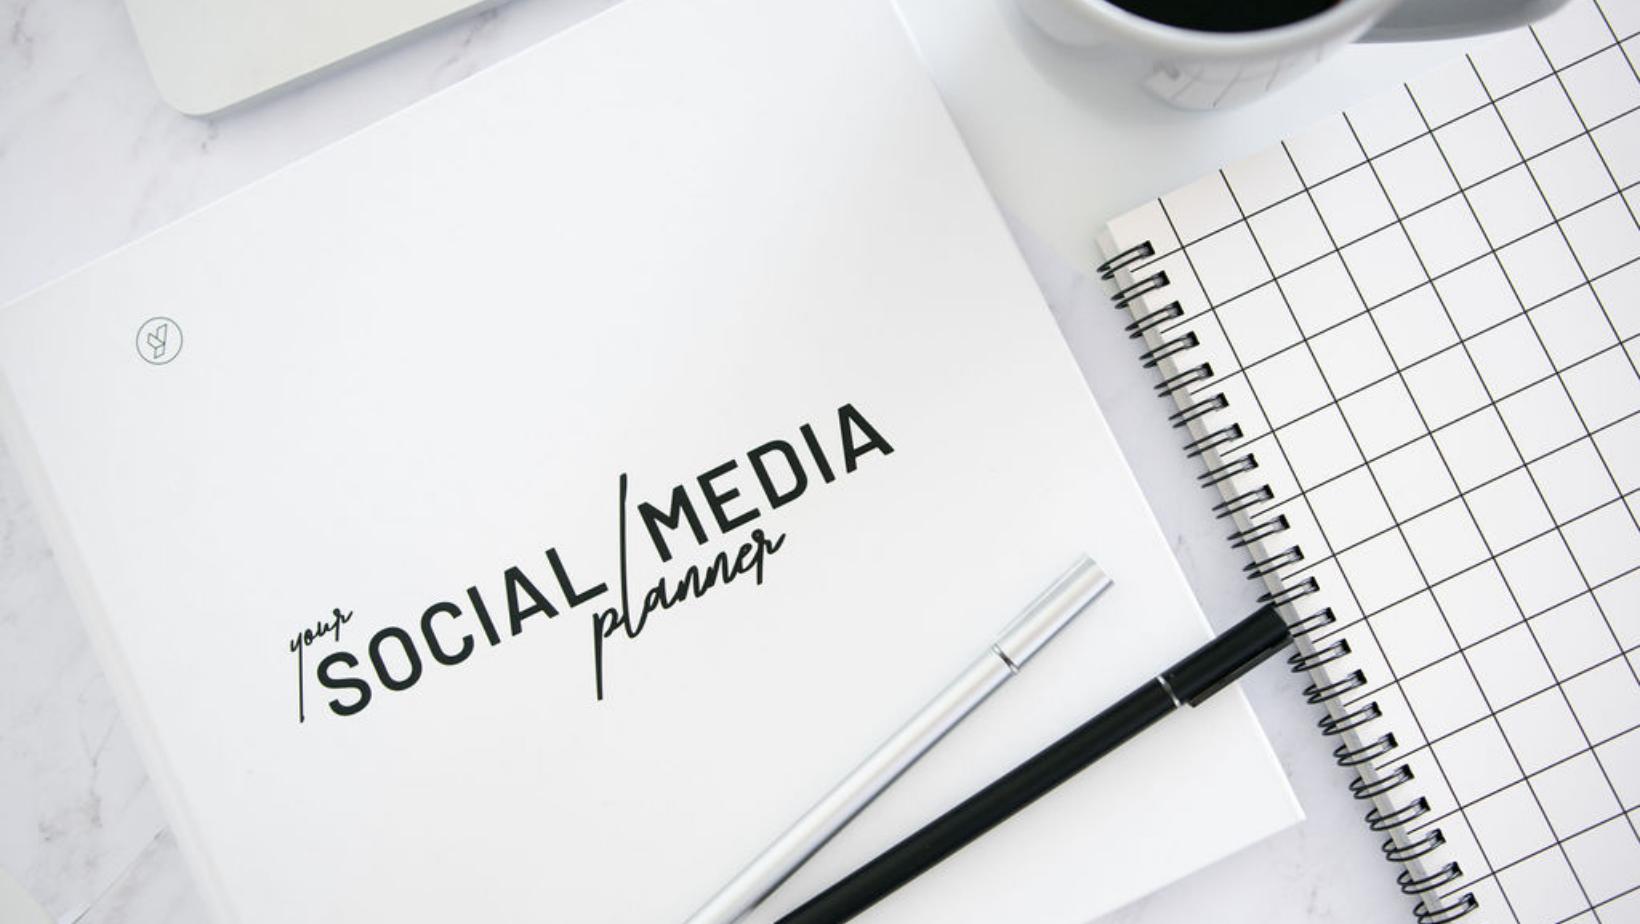 Social media planner by Empathie marketing.